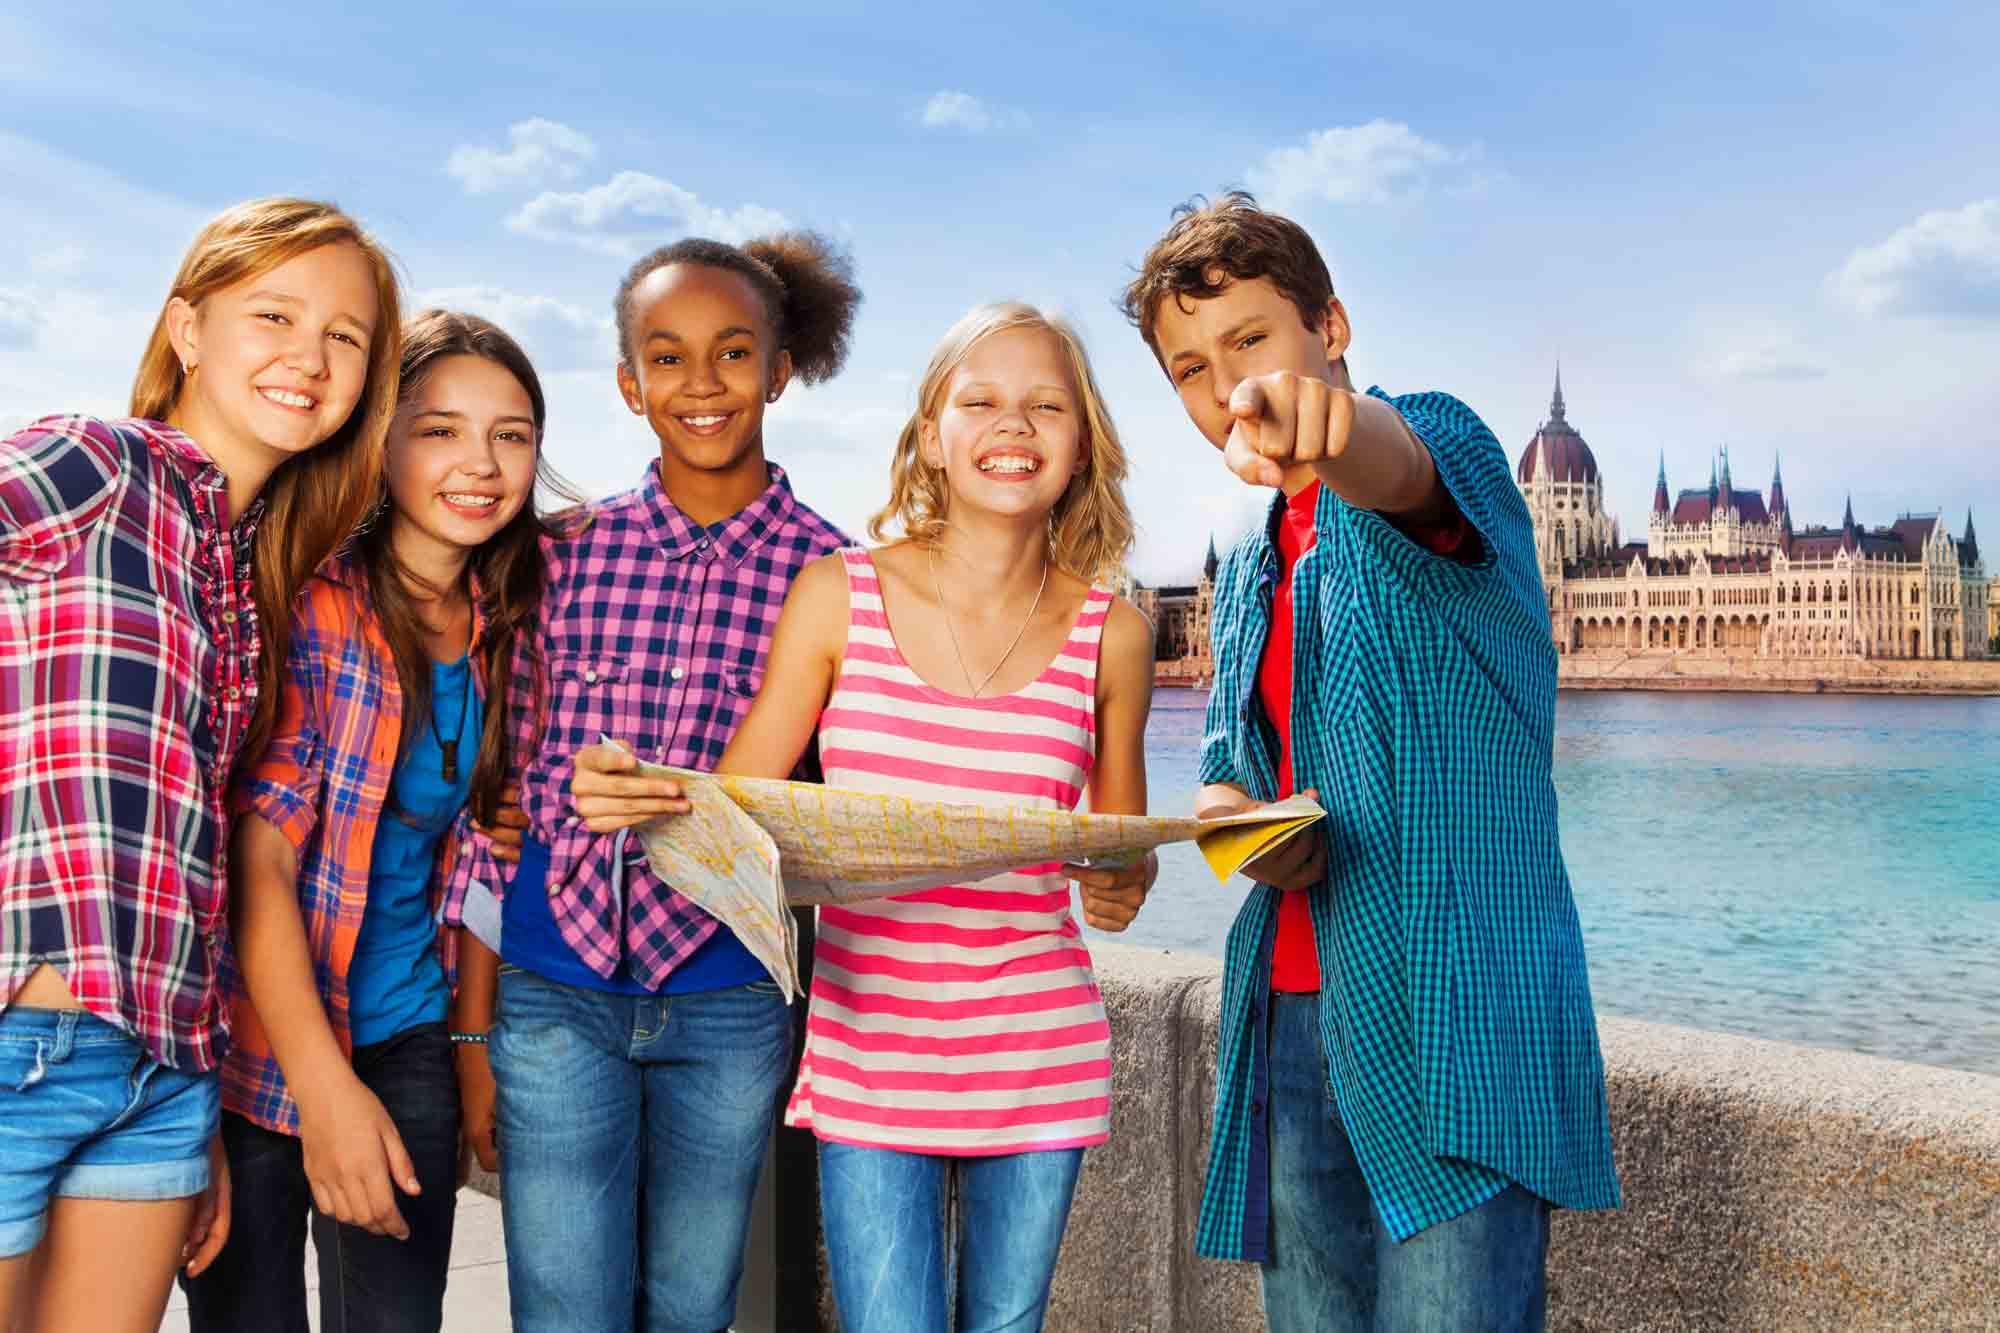 Teenagers sightseeing